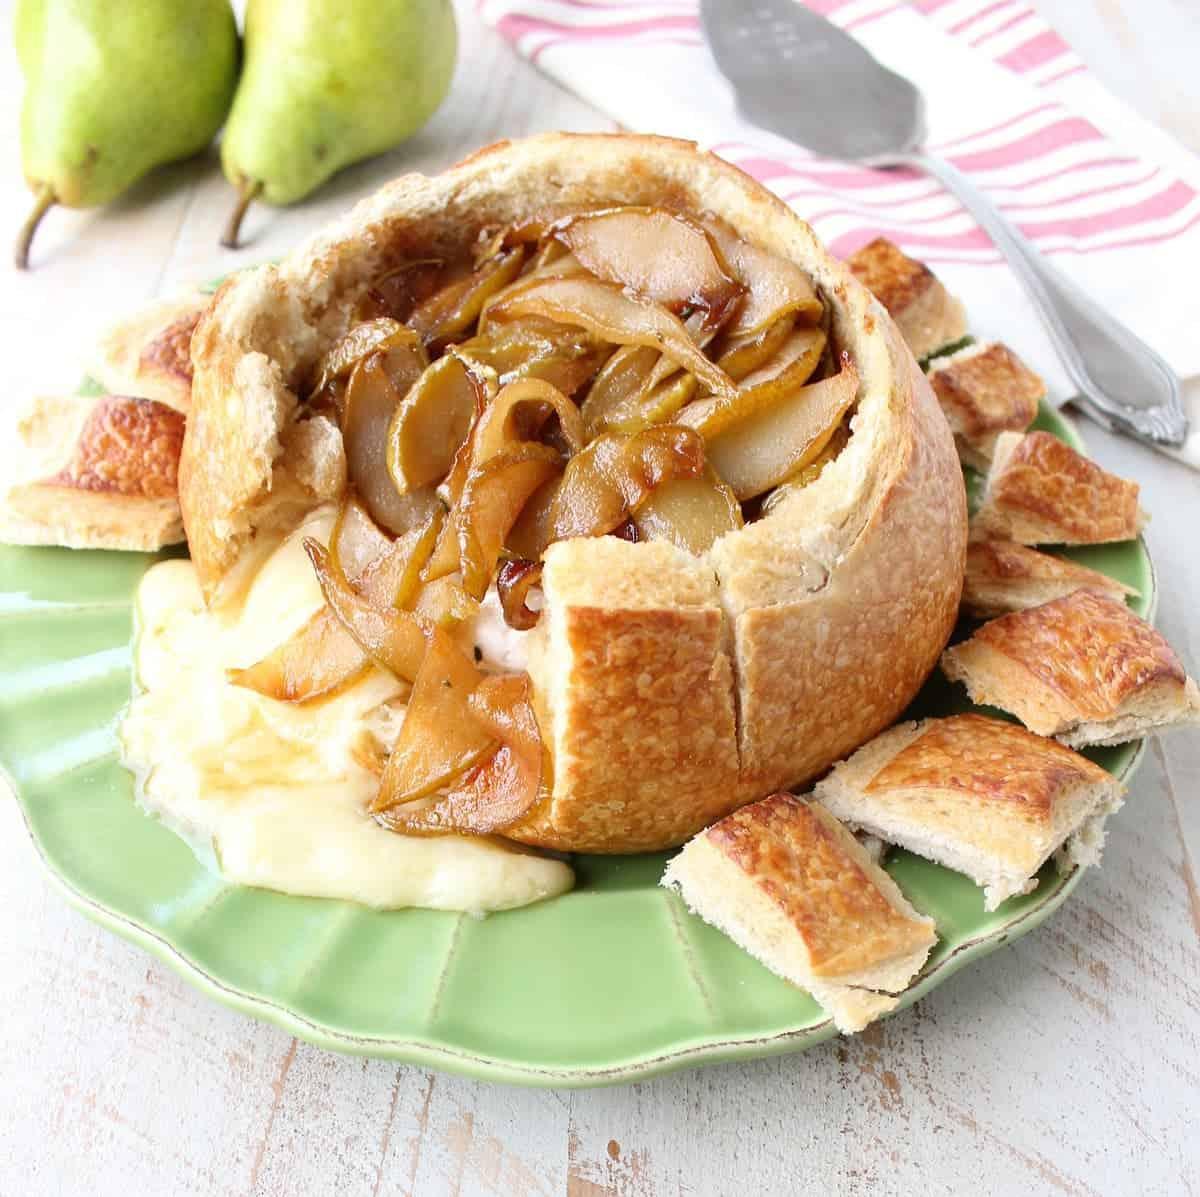 Caramelized Pear Baked Brie Sourdough Bread Bowl